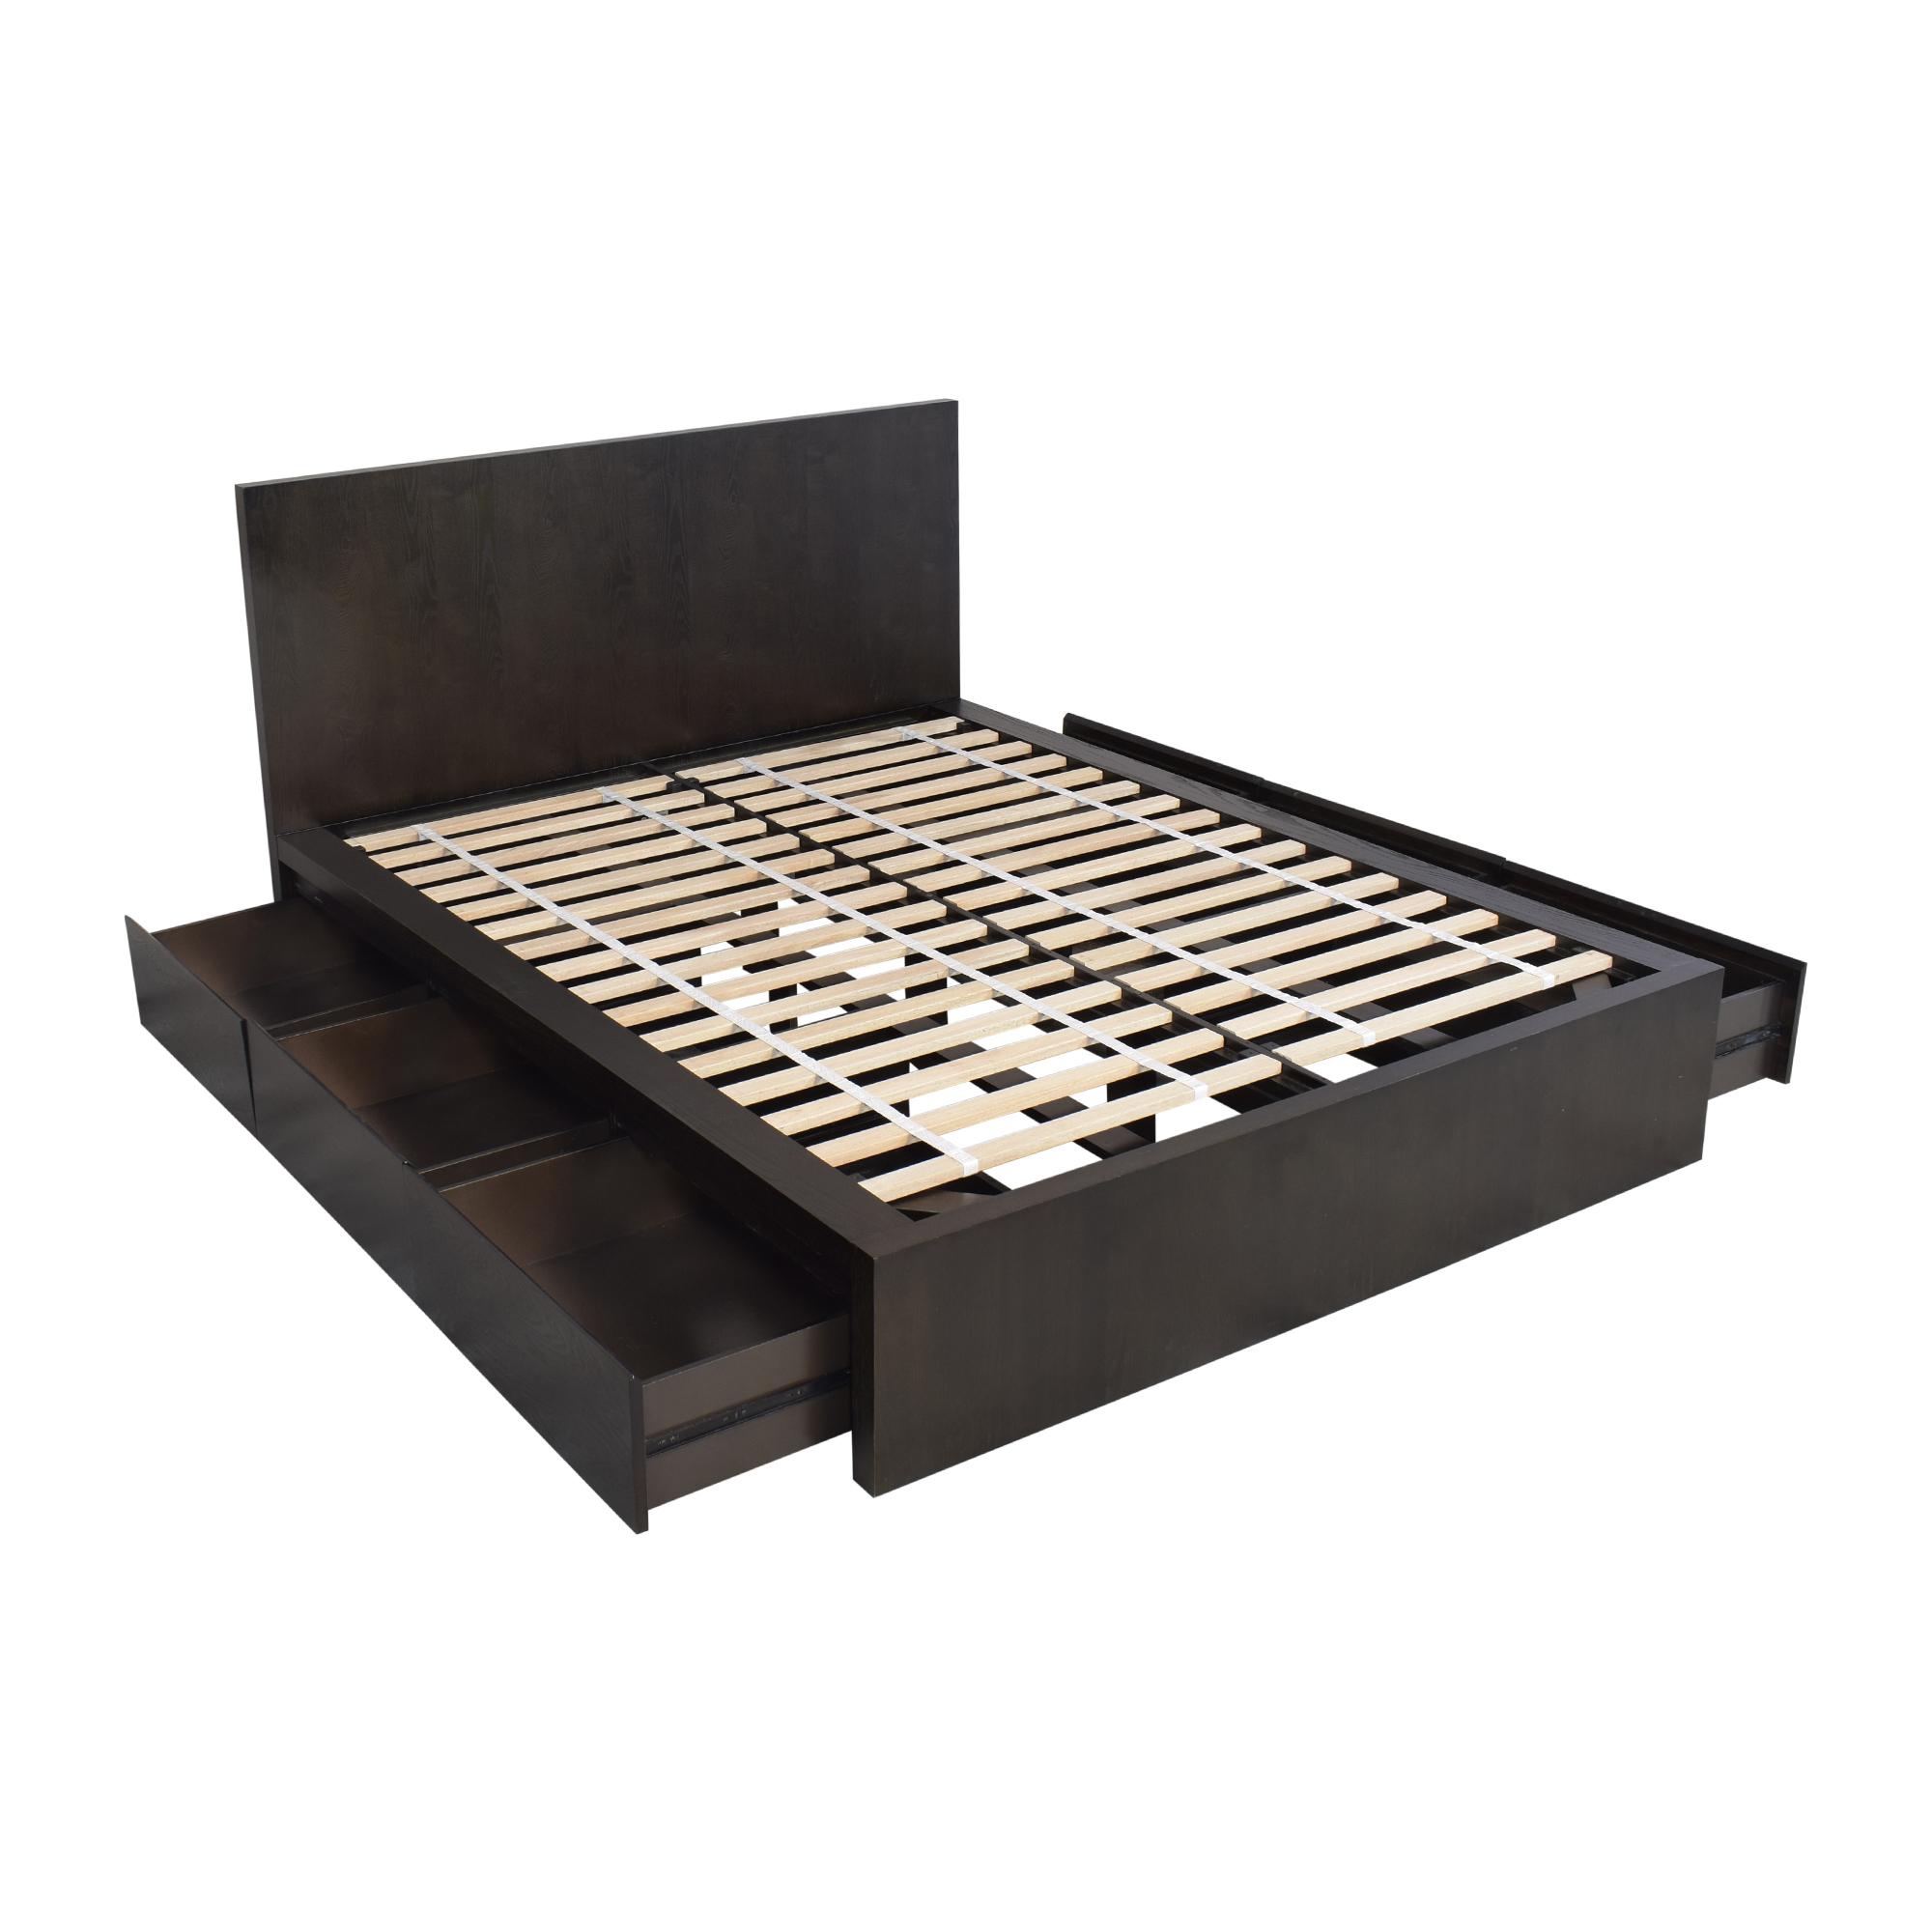 West Elm West Elm Queen Six Drawer Storage Bed on sale